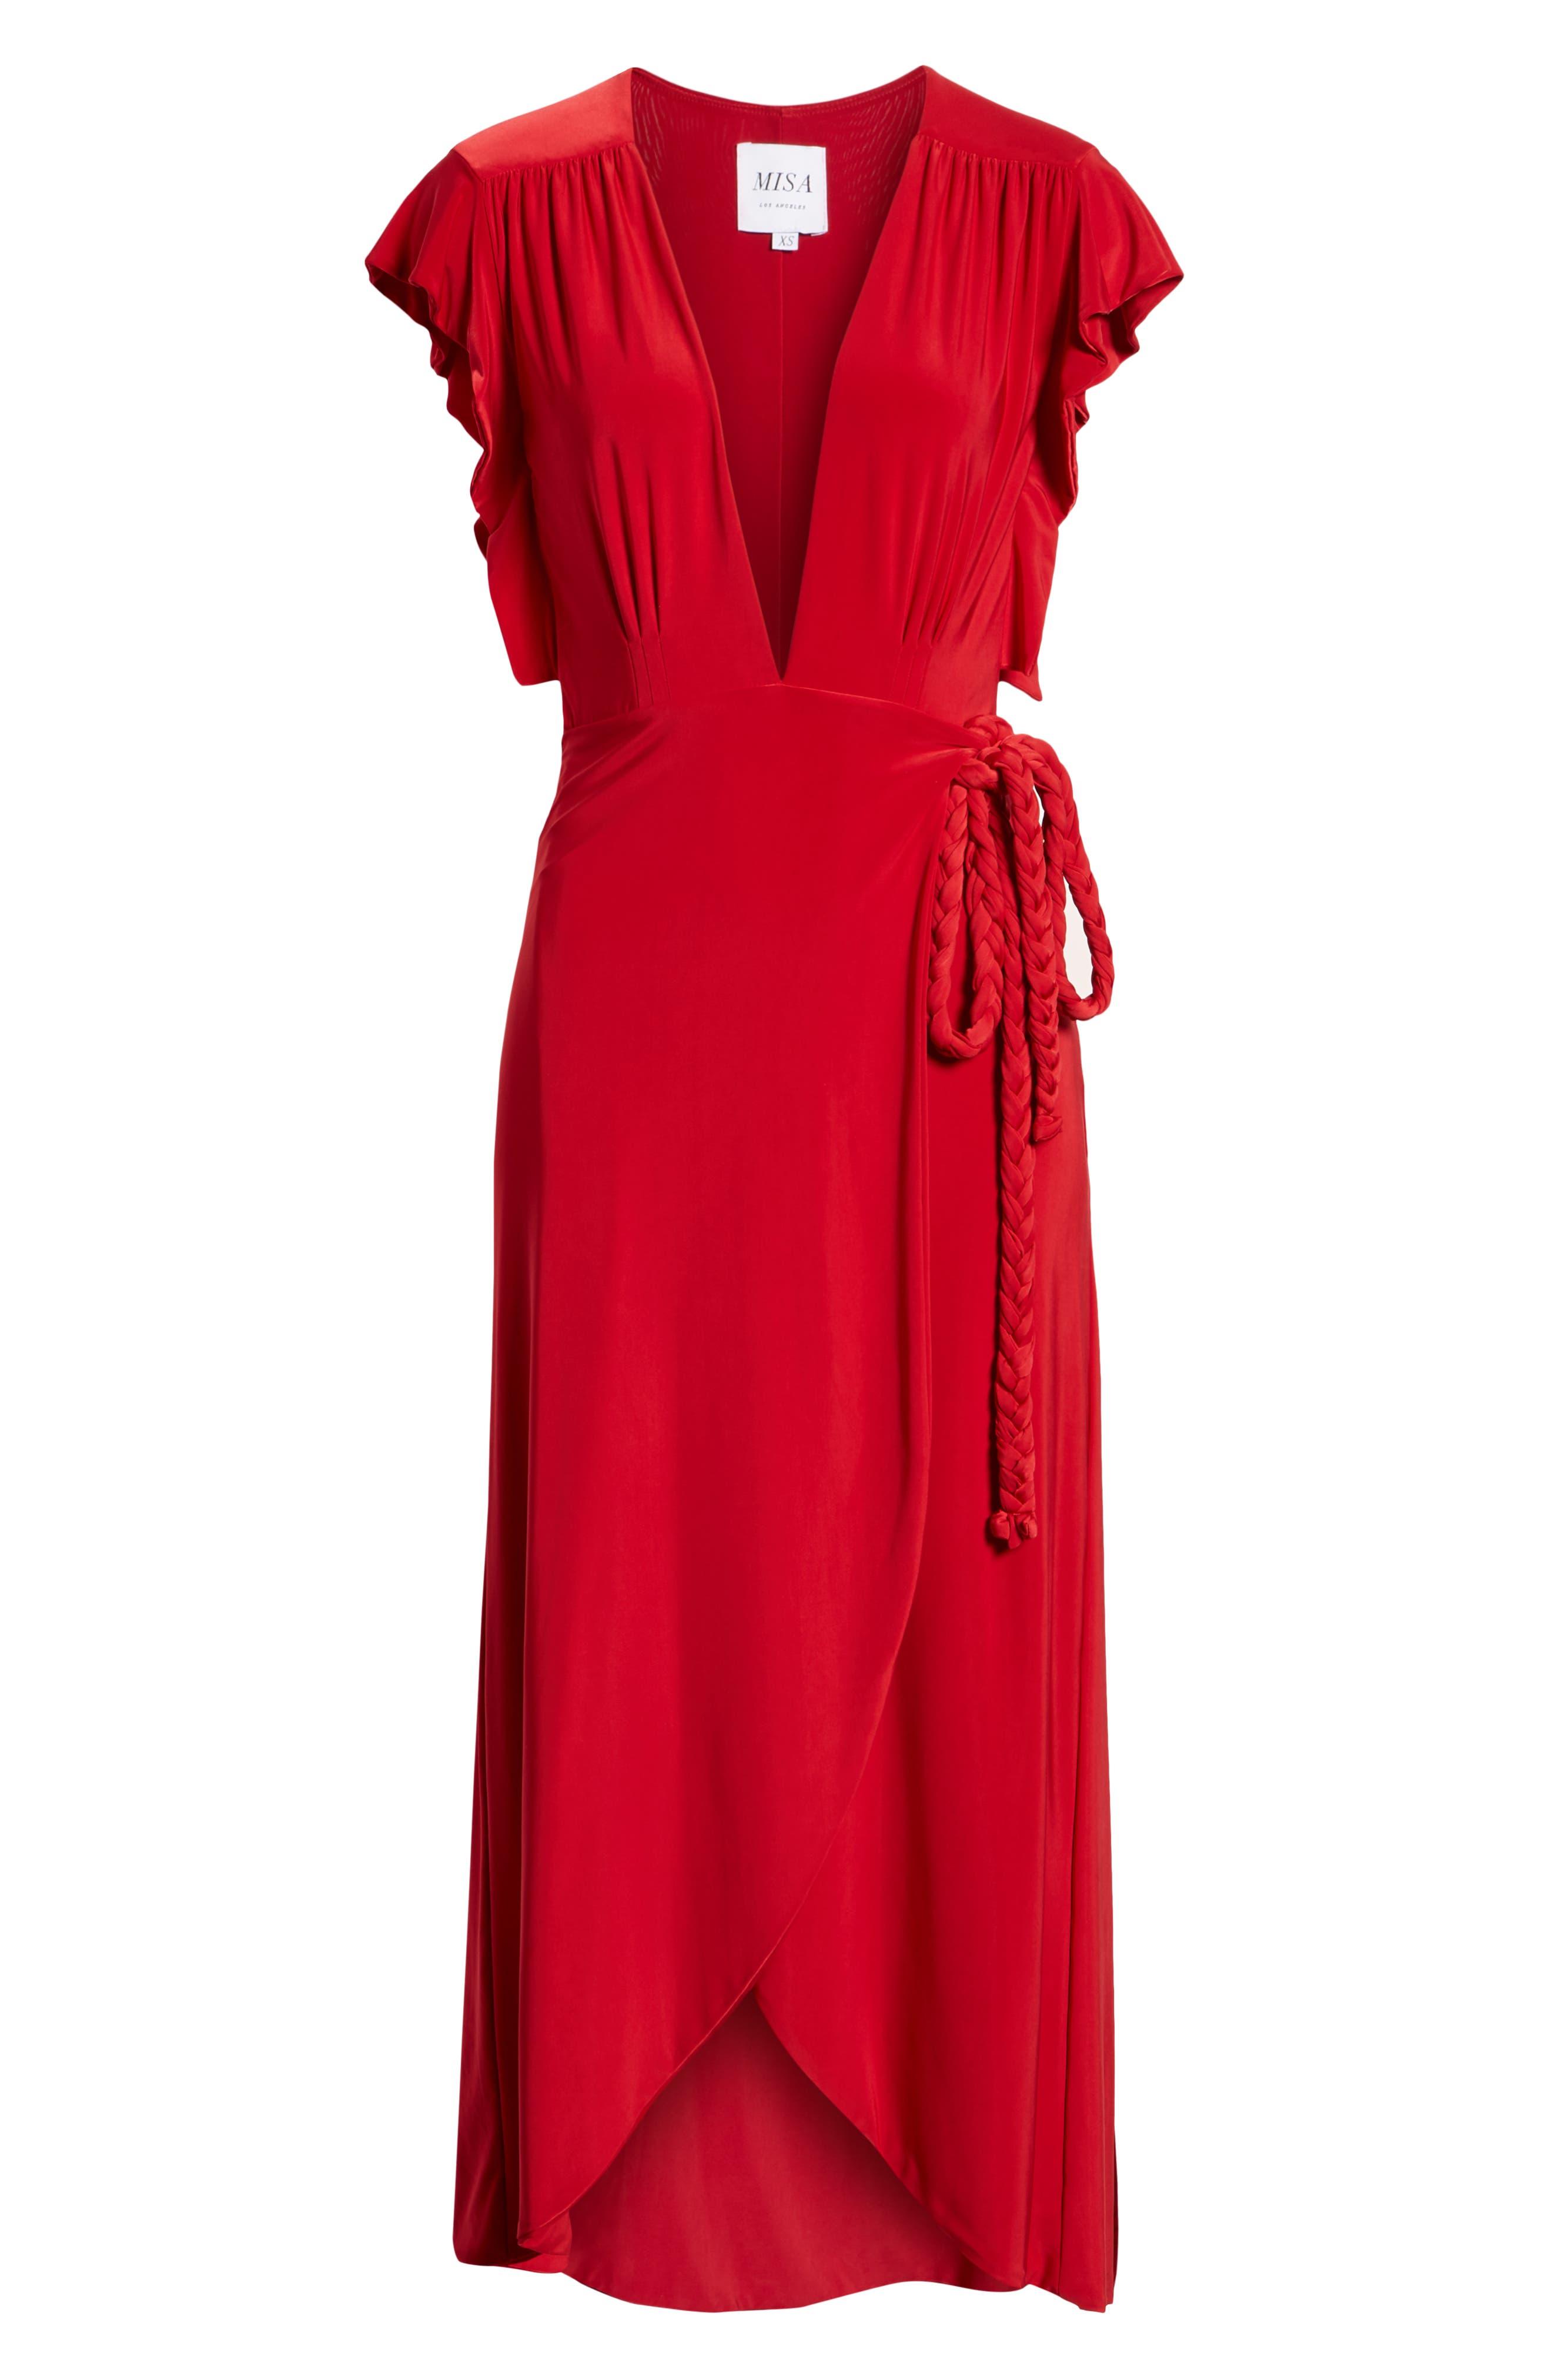 MISA LOS ANGELES, Irina Dress, Alternate thumbnail 7, color, RED